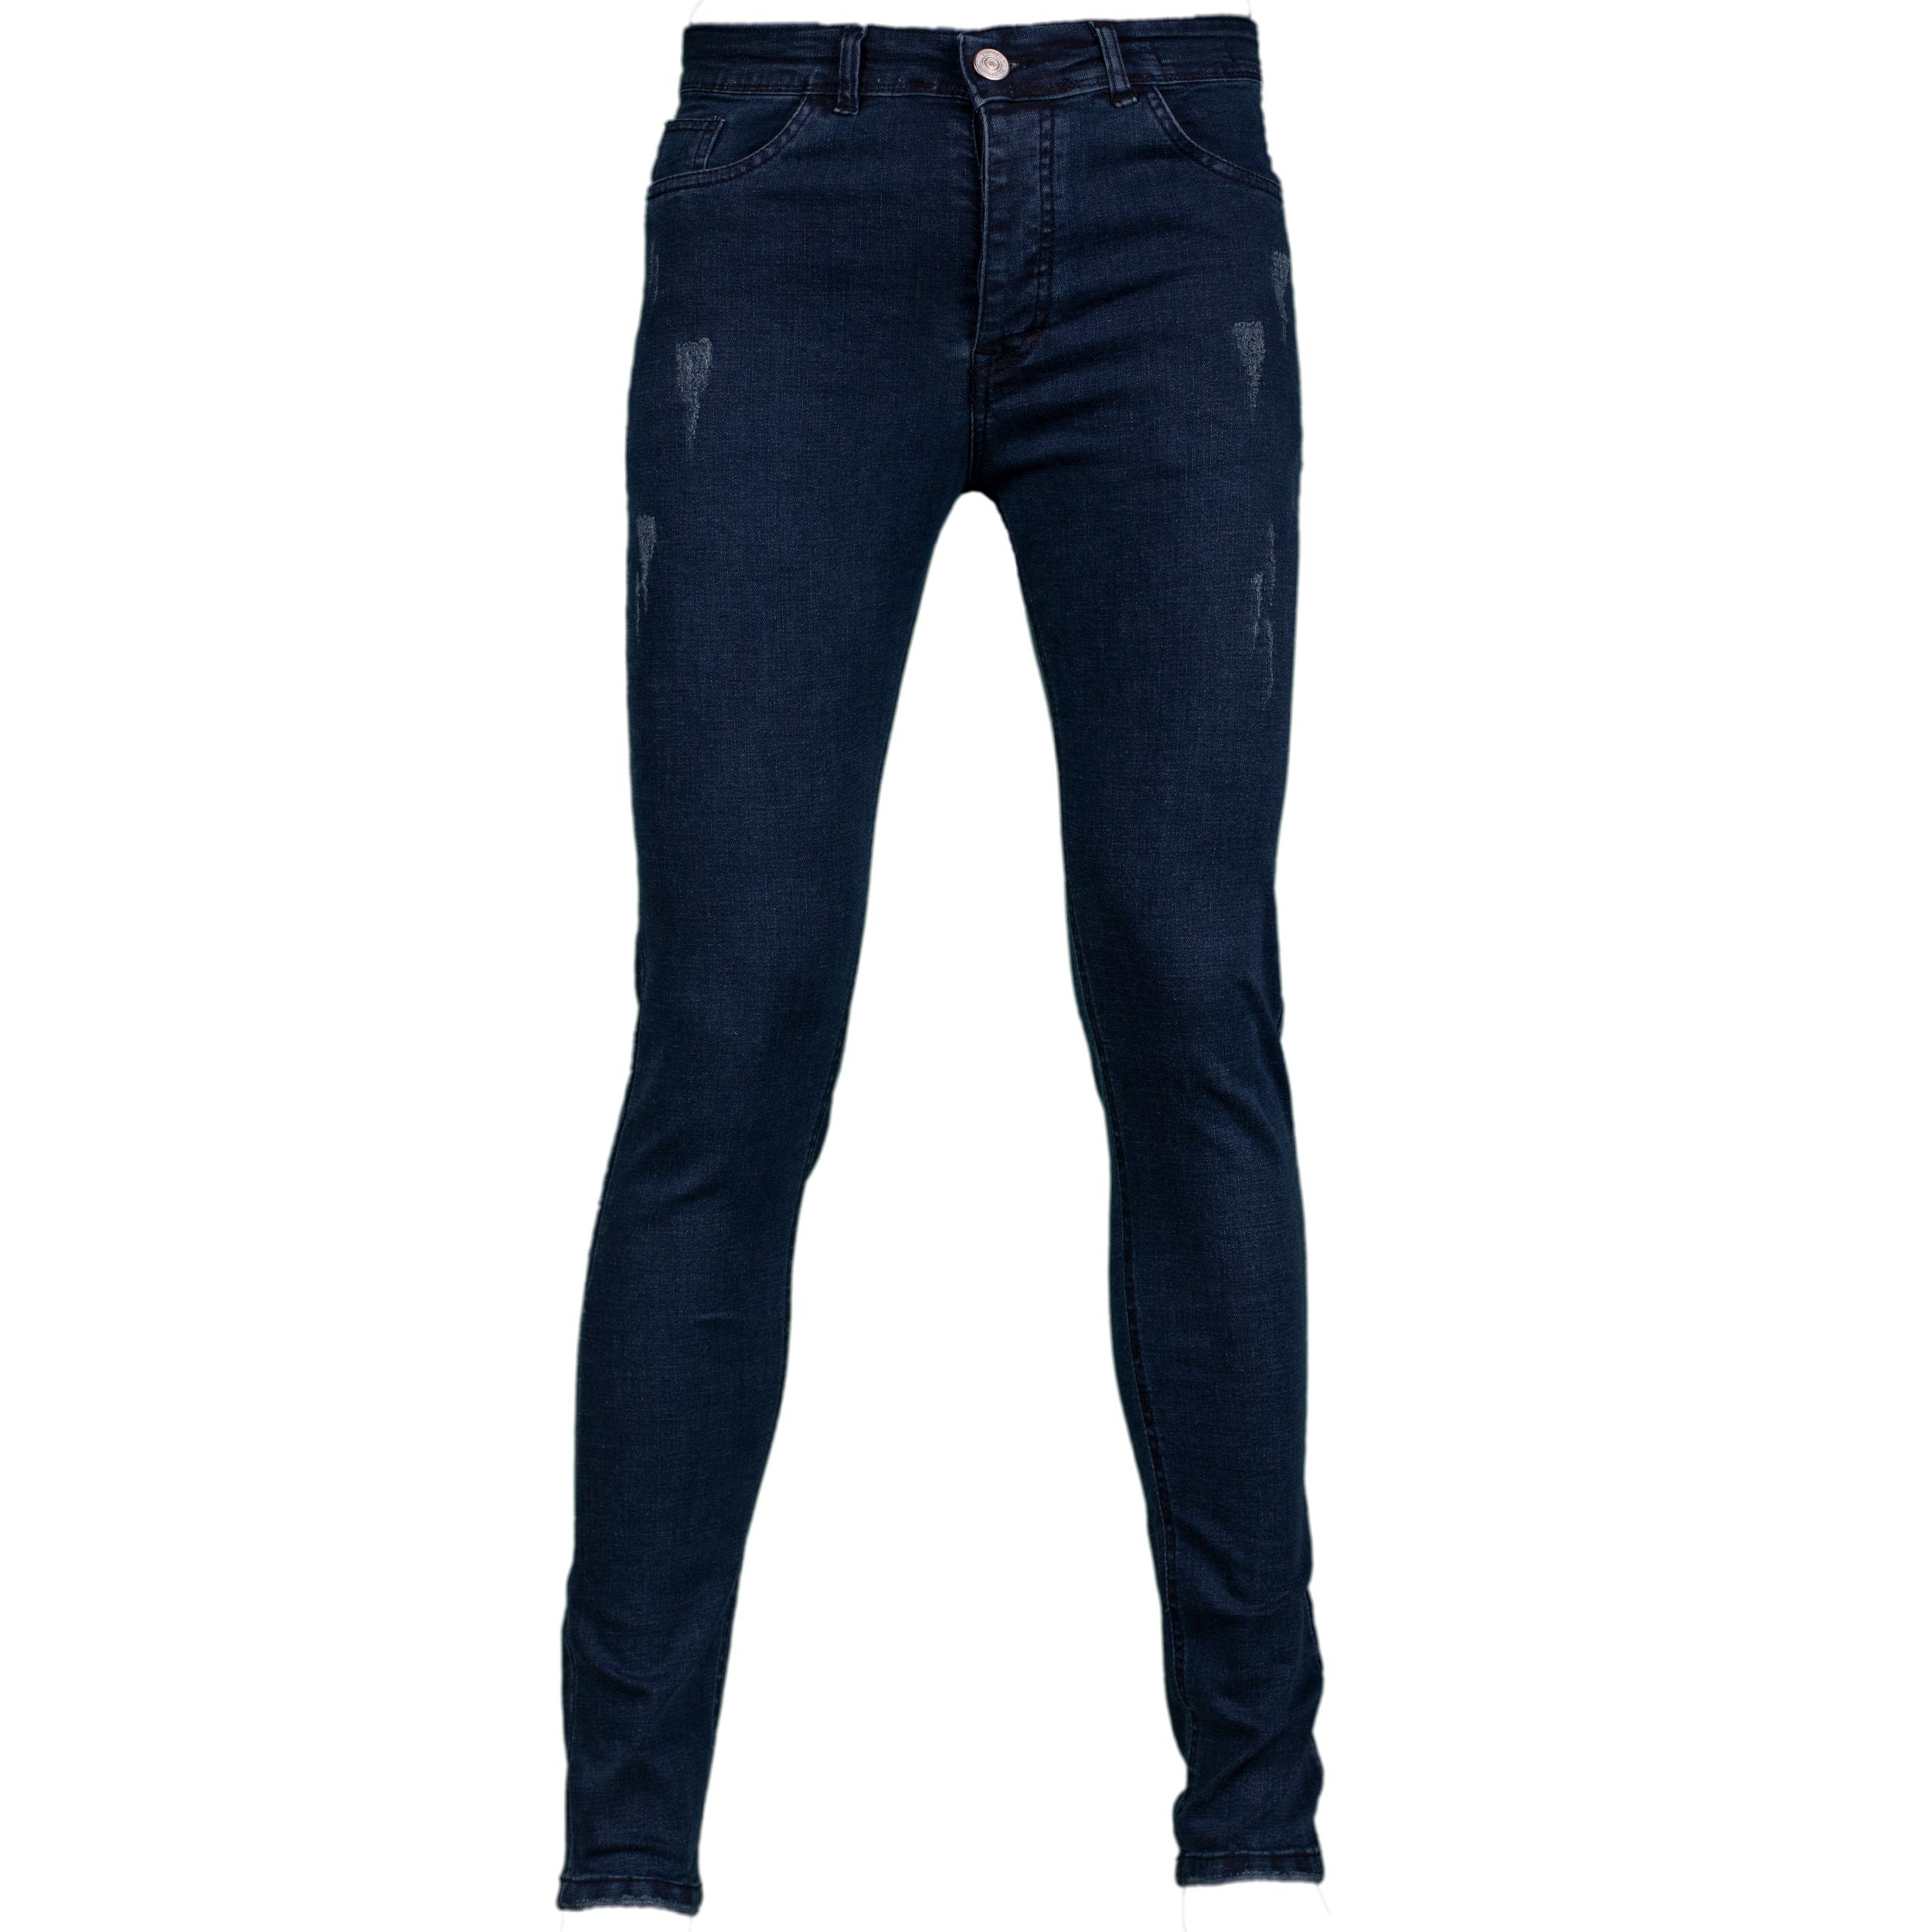 شلوار جین مردانه  کد s16